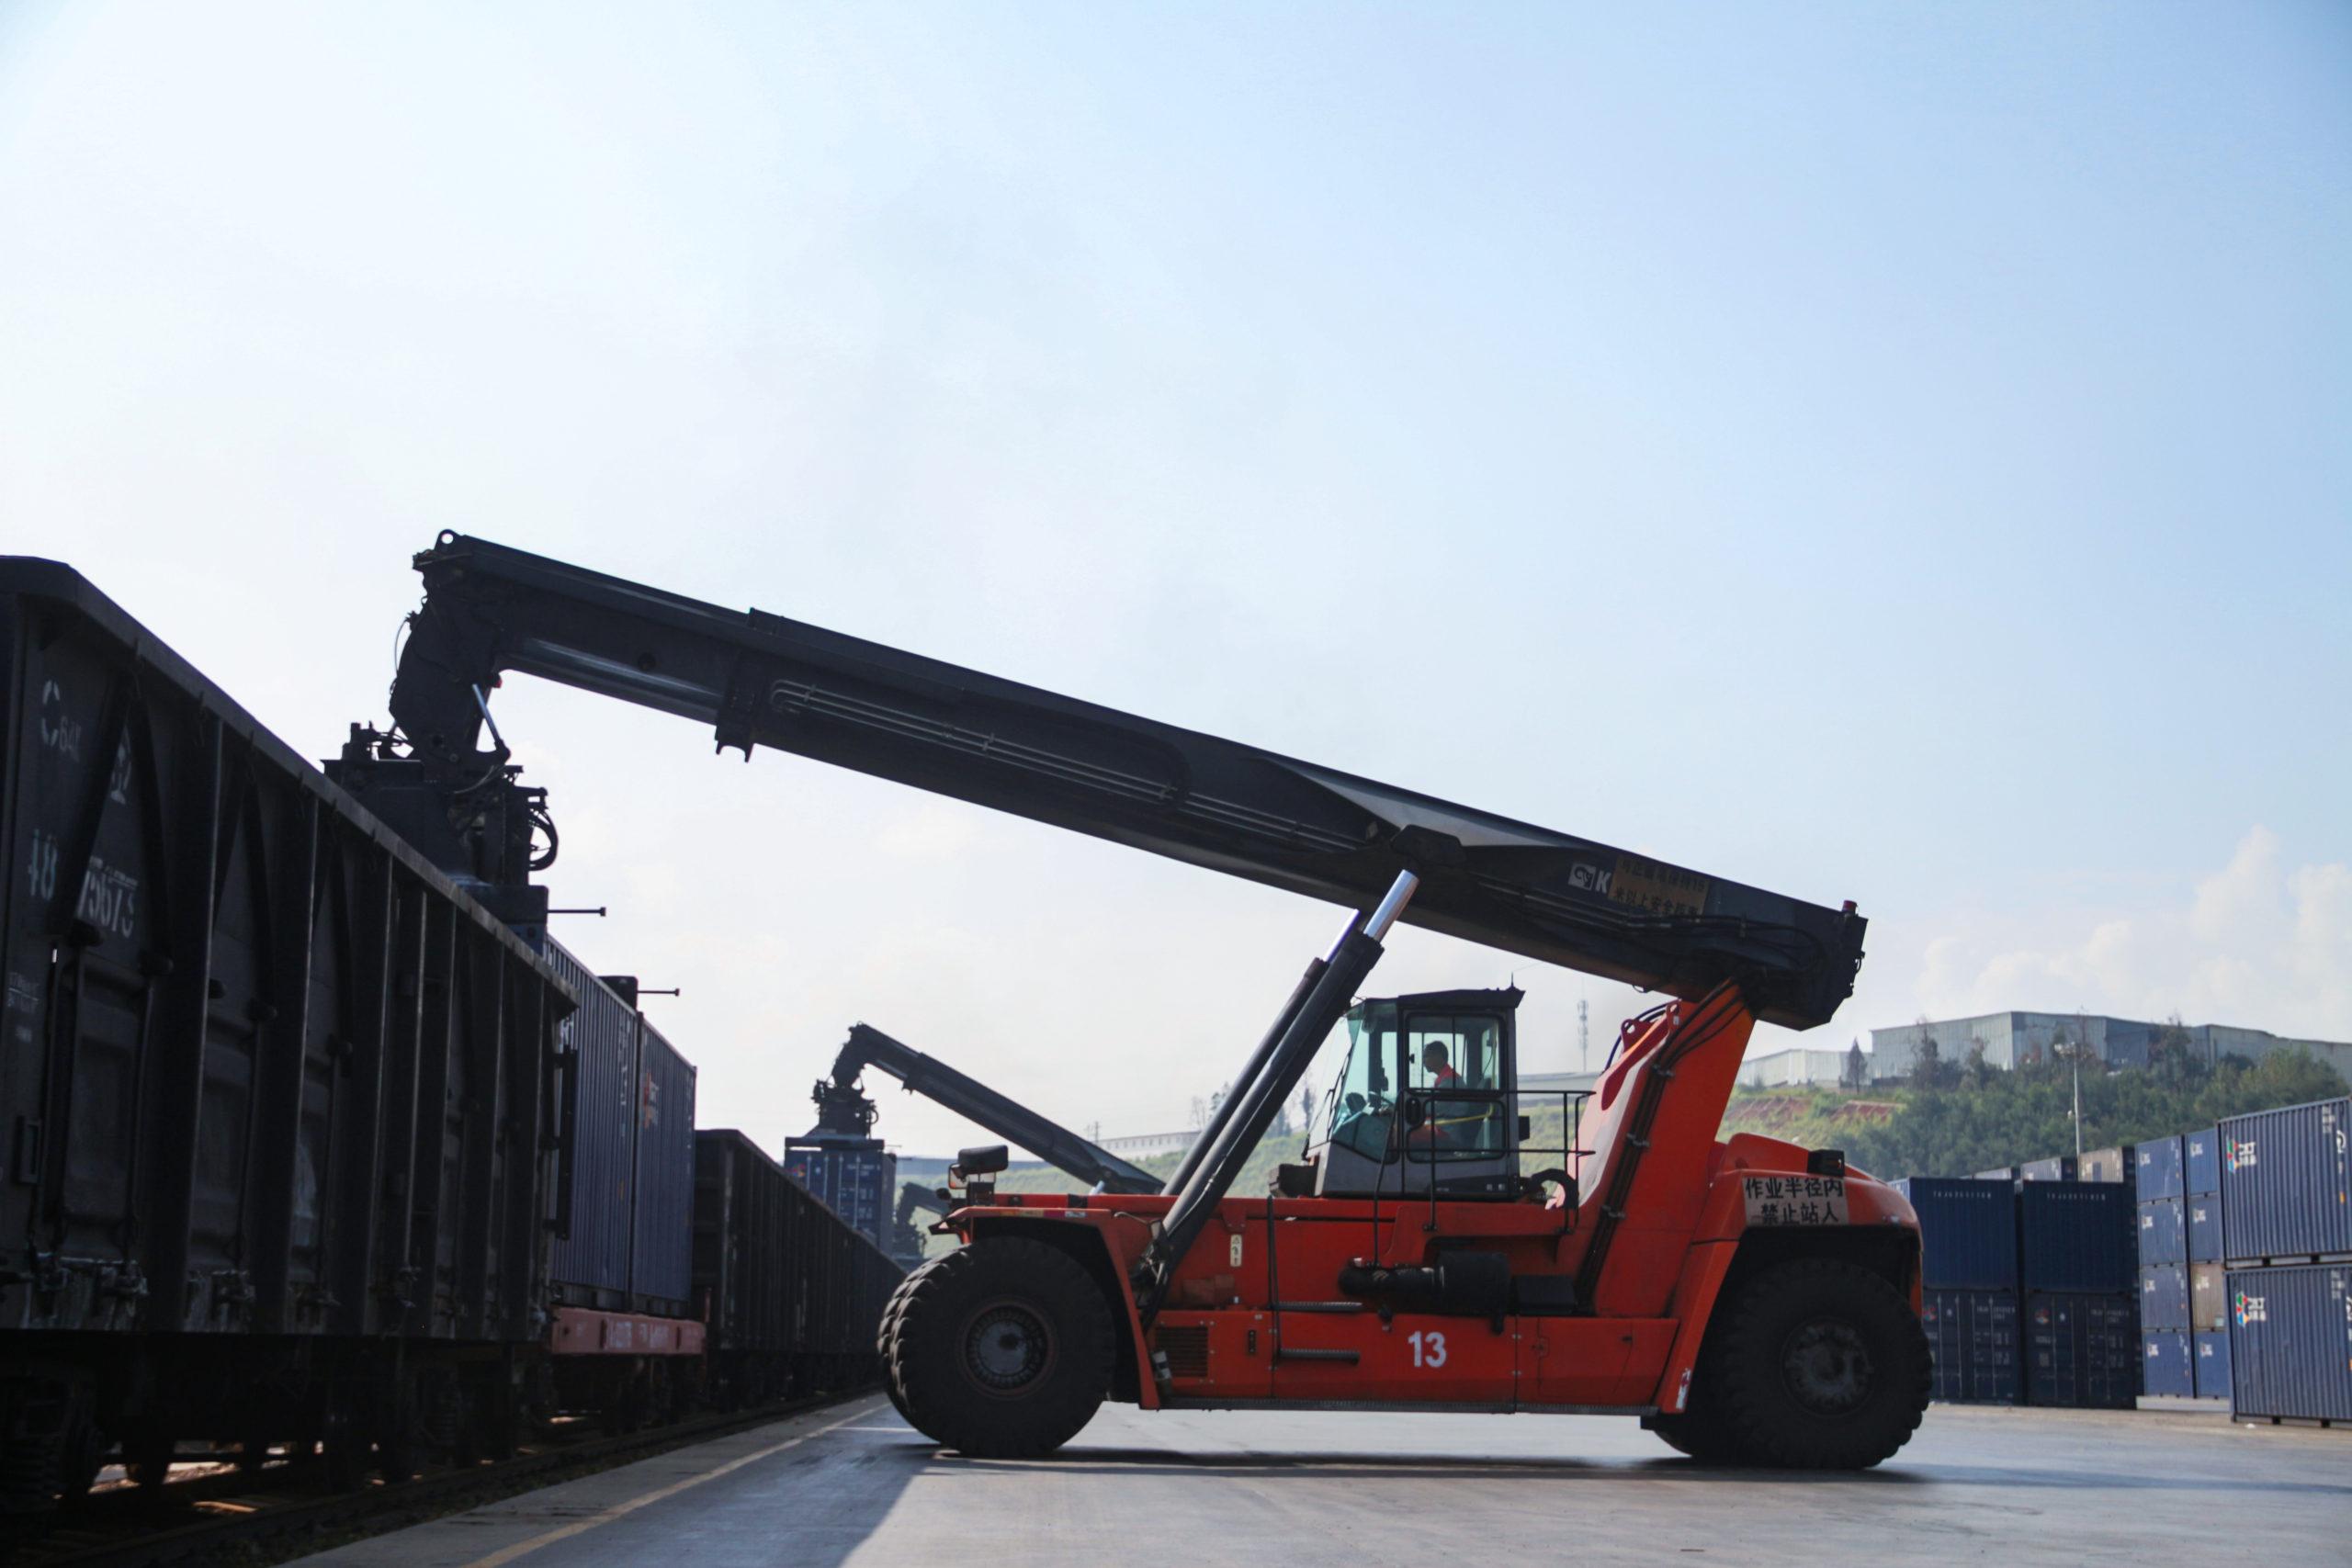 kalmar-essential-reachstacker-in-intermodal-operations-in-china